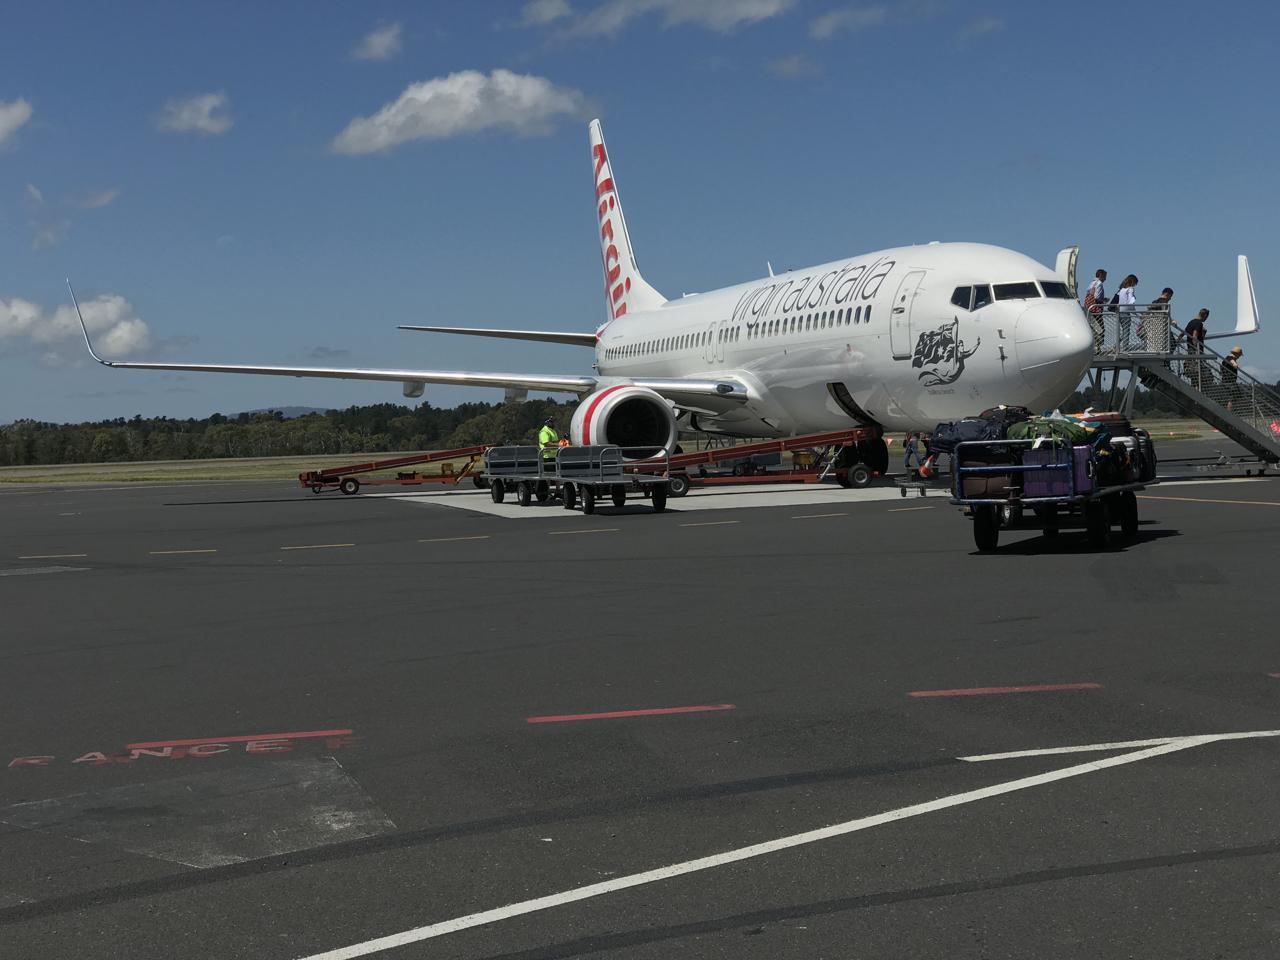 Virgin Australia Business Class: OOL-SYD B737-800 – Palo